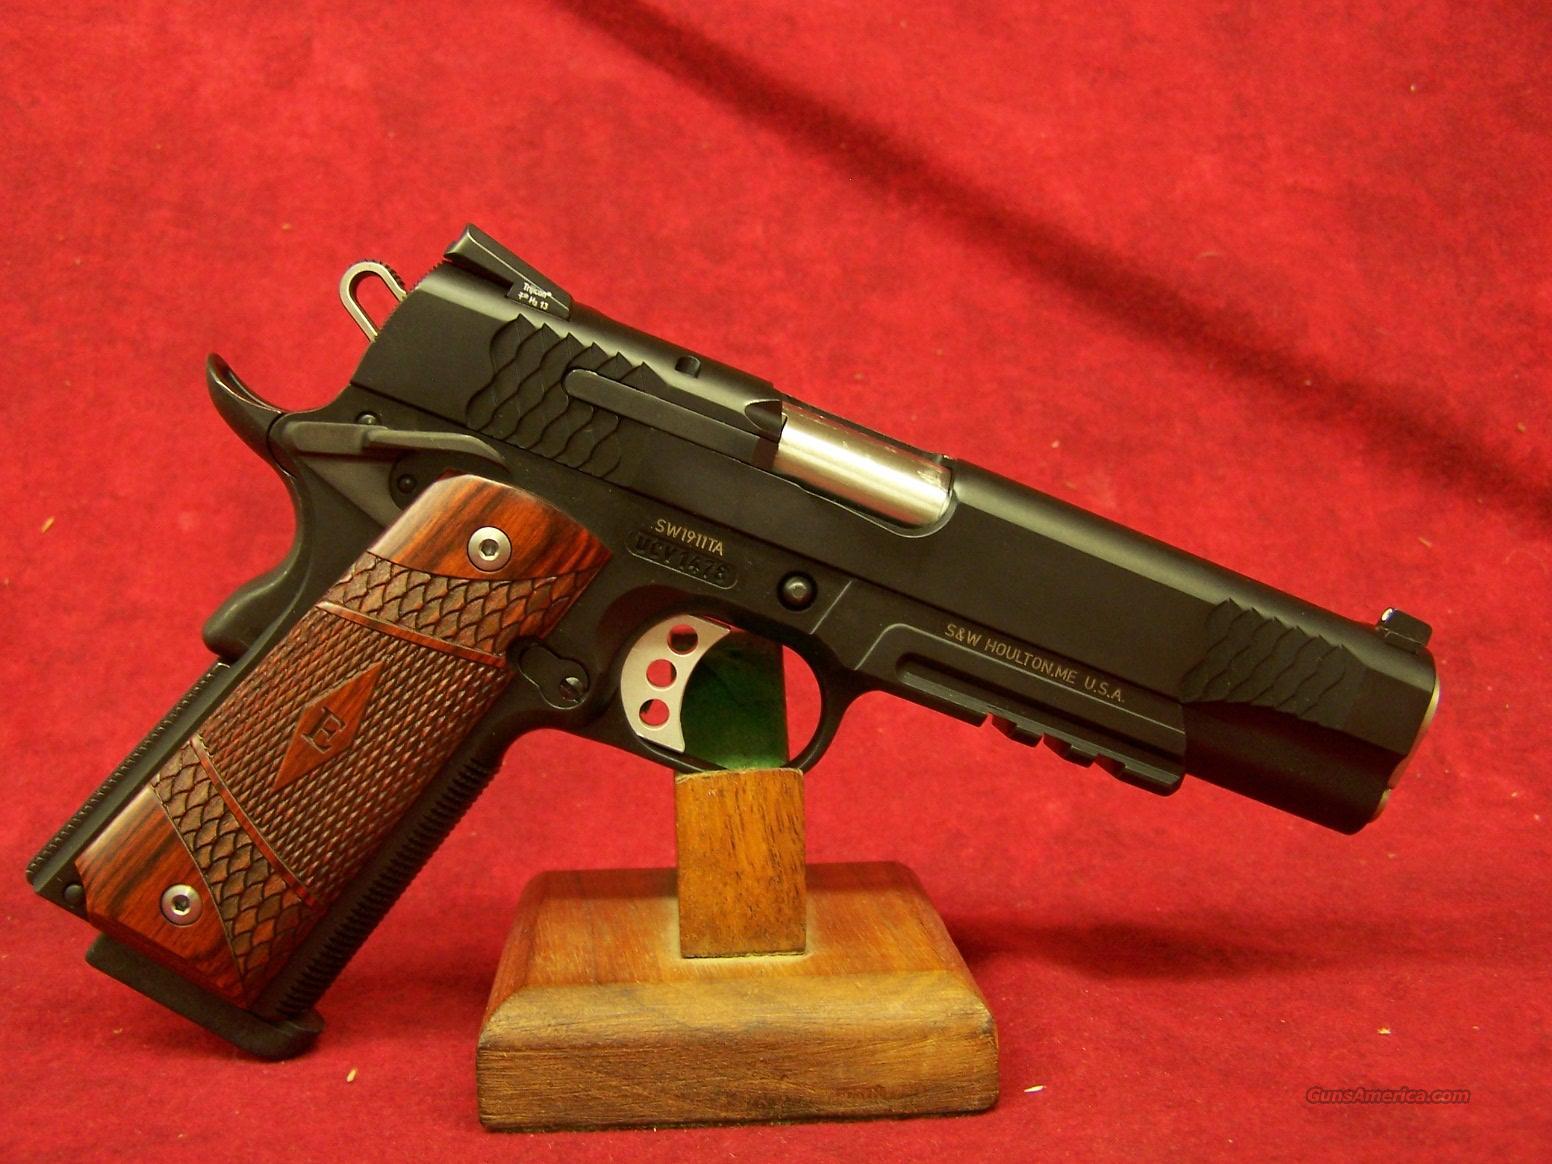 Smith & Wesson 1911 .45ACP SW1911TA  Guns > Pistols > Smith & Wesson Pistols - Autos > Steel Frame